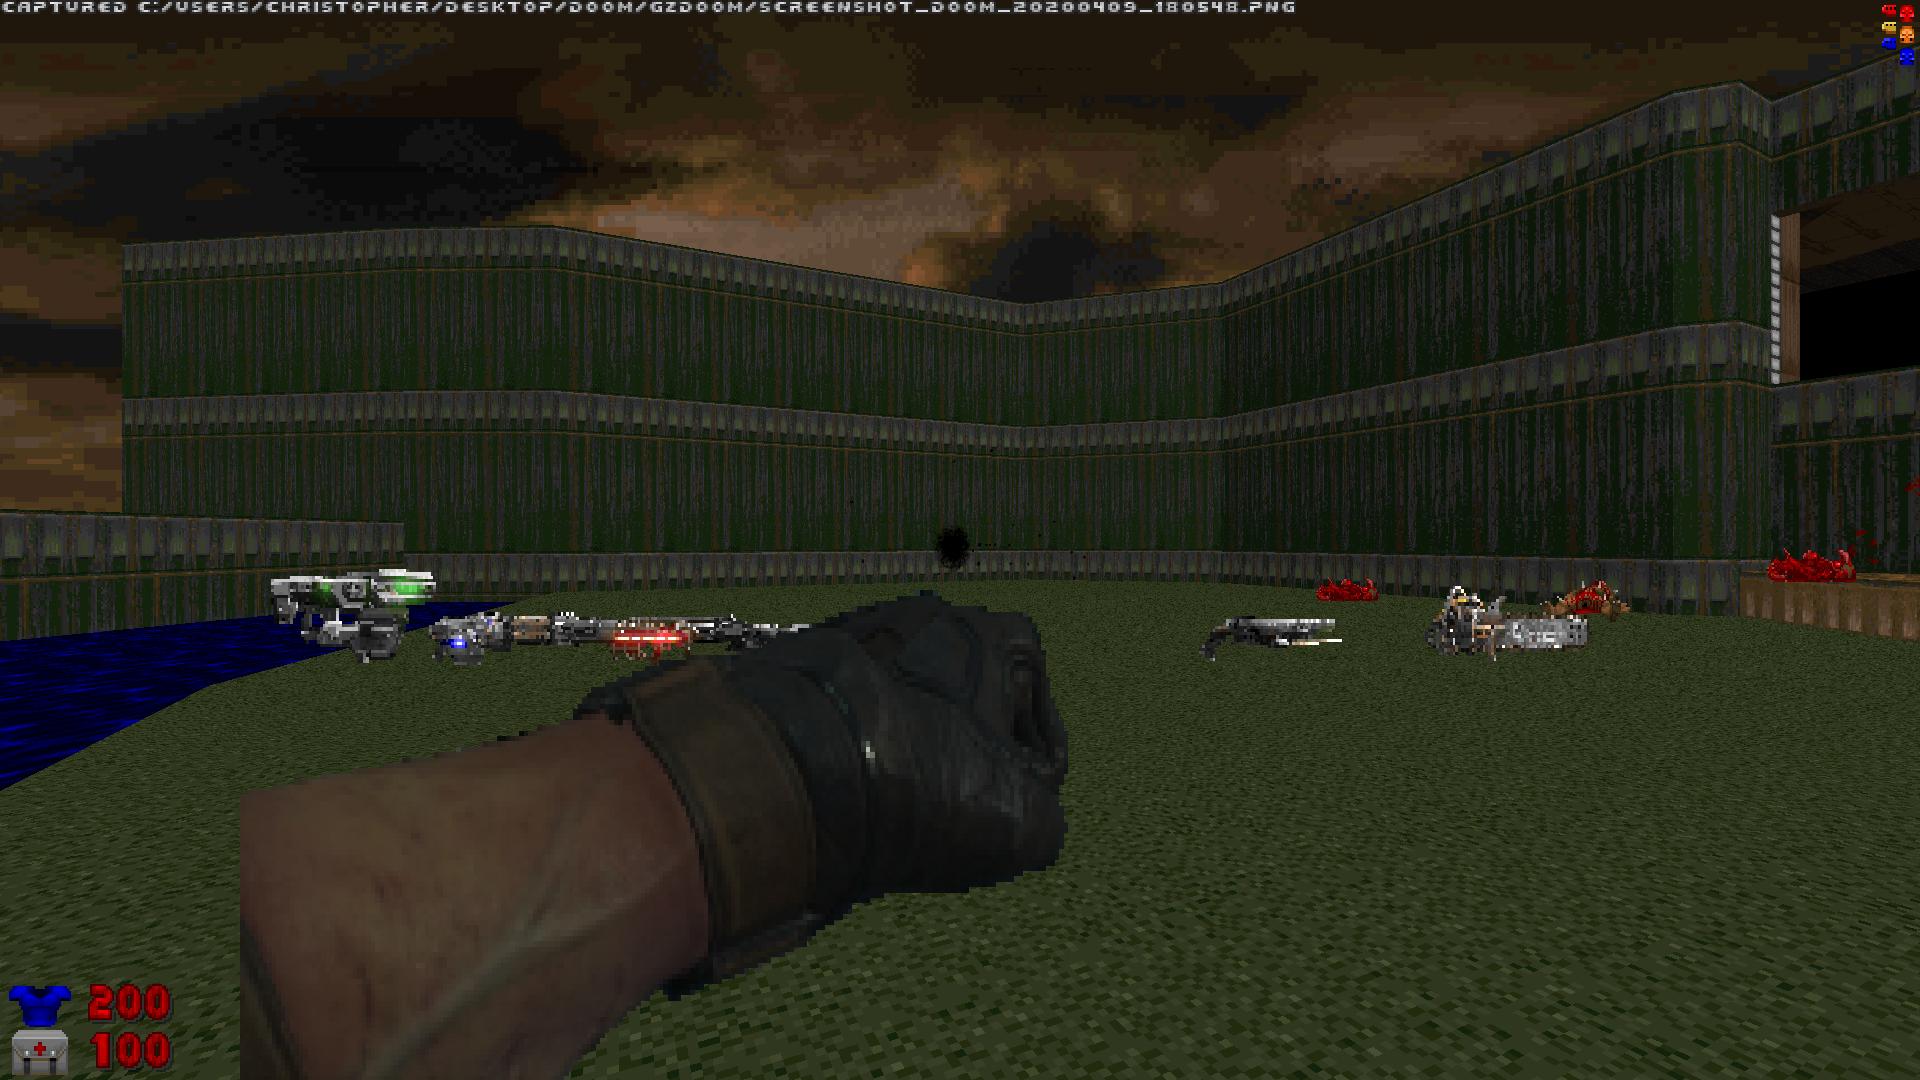 Screenshot_Doom_20200409_180550.png.71e3b4407a919e74b966542a650e5d7c.png